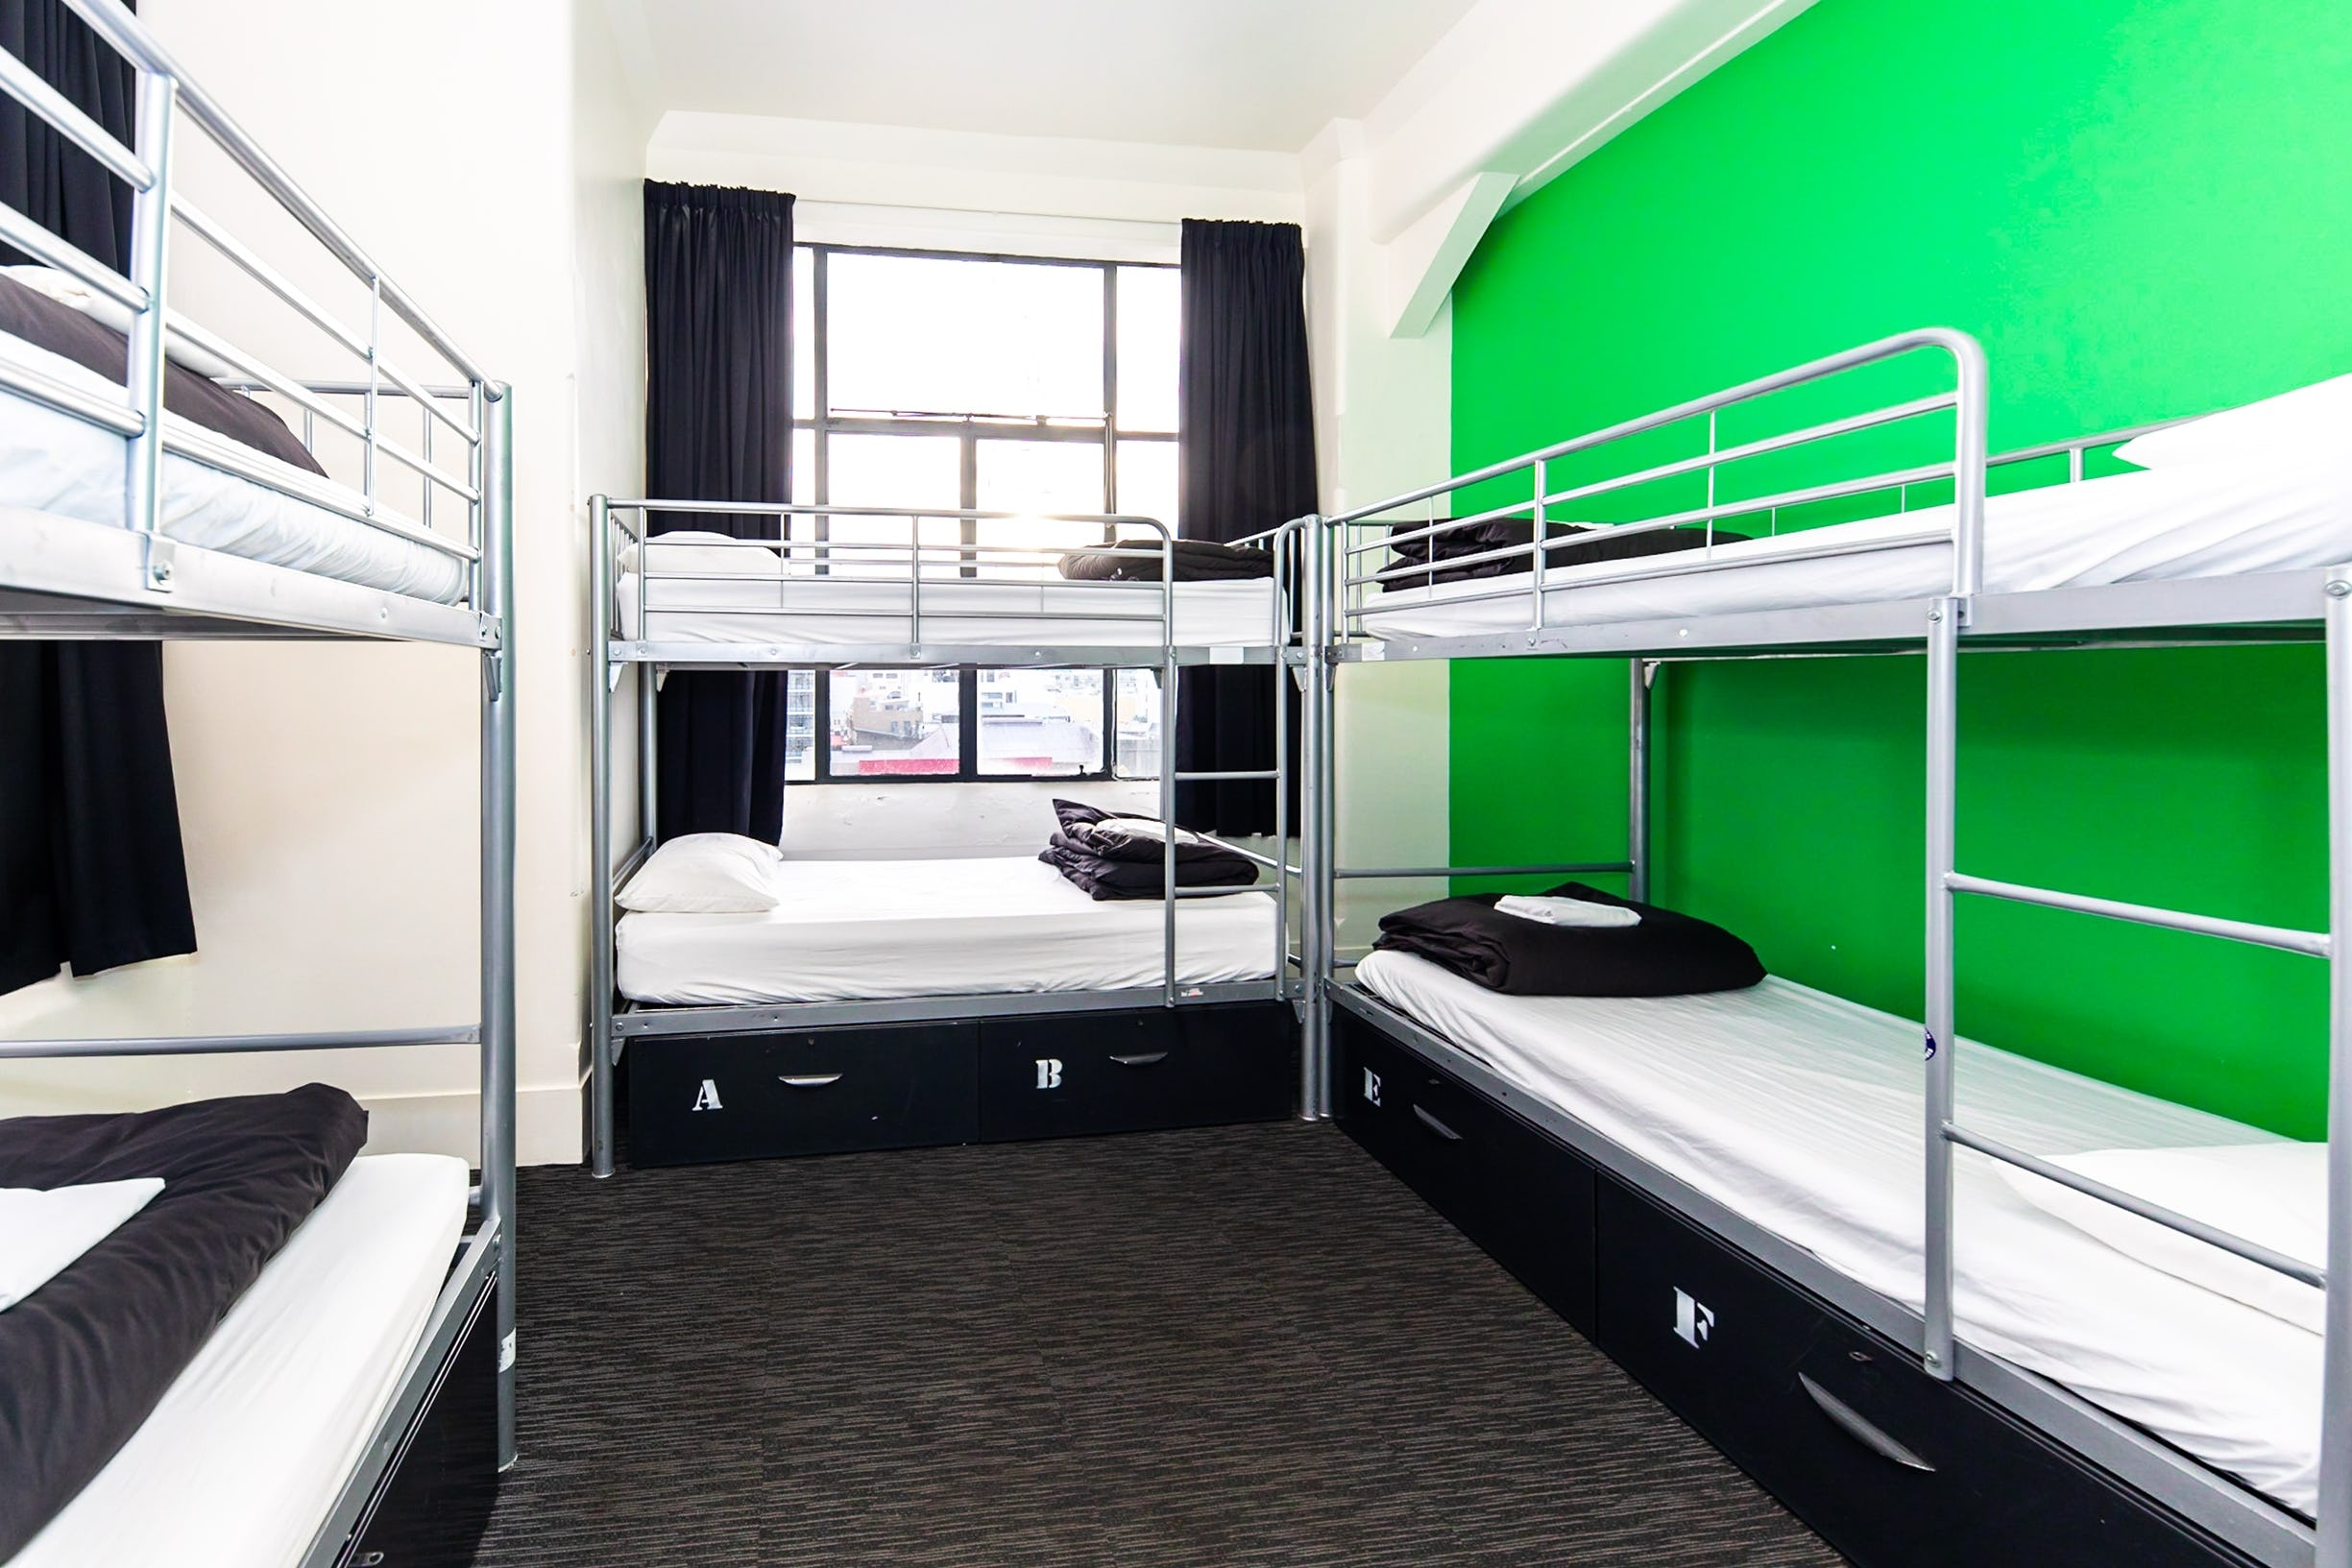 Base惠灵顿背包客旅馆的6床宿舍